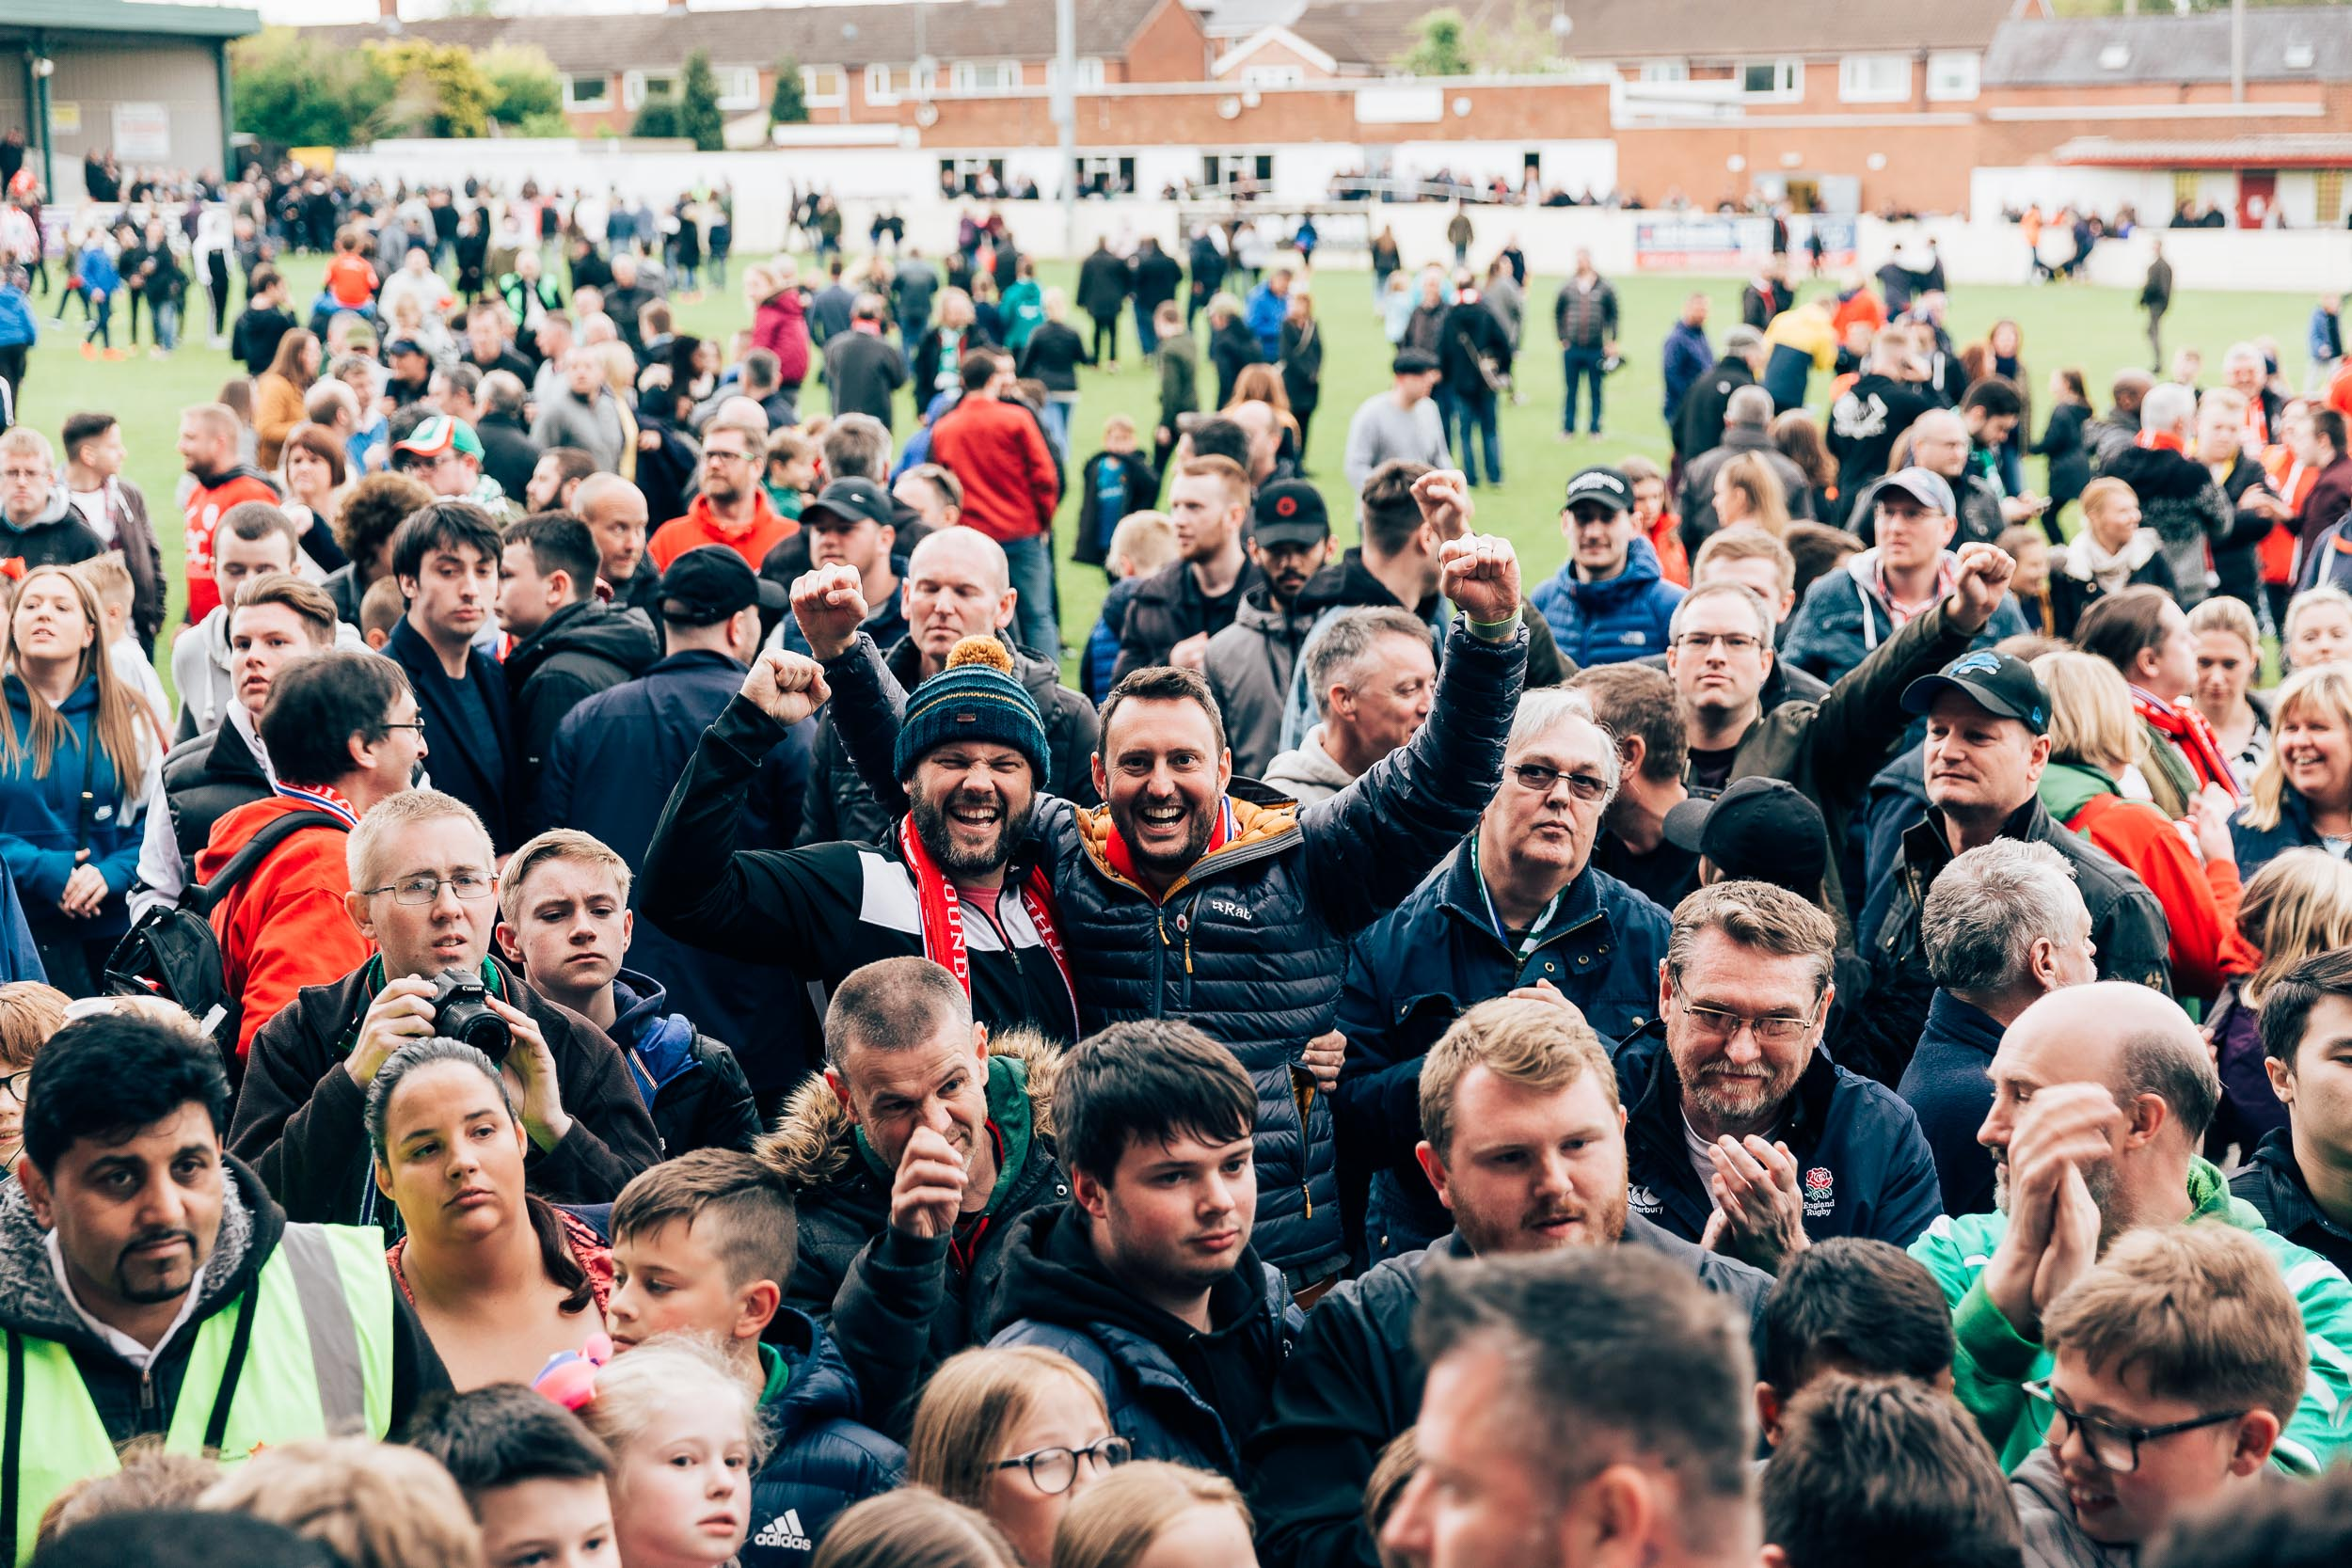 06_05_2019_Bromsgrove_Sporting_Corby-231.jpg